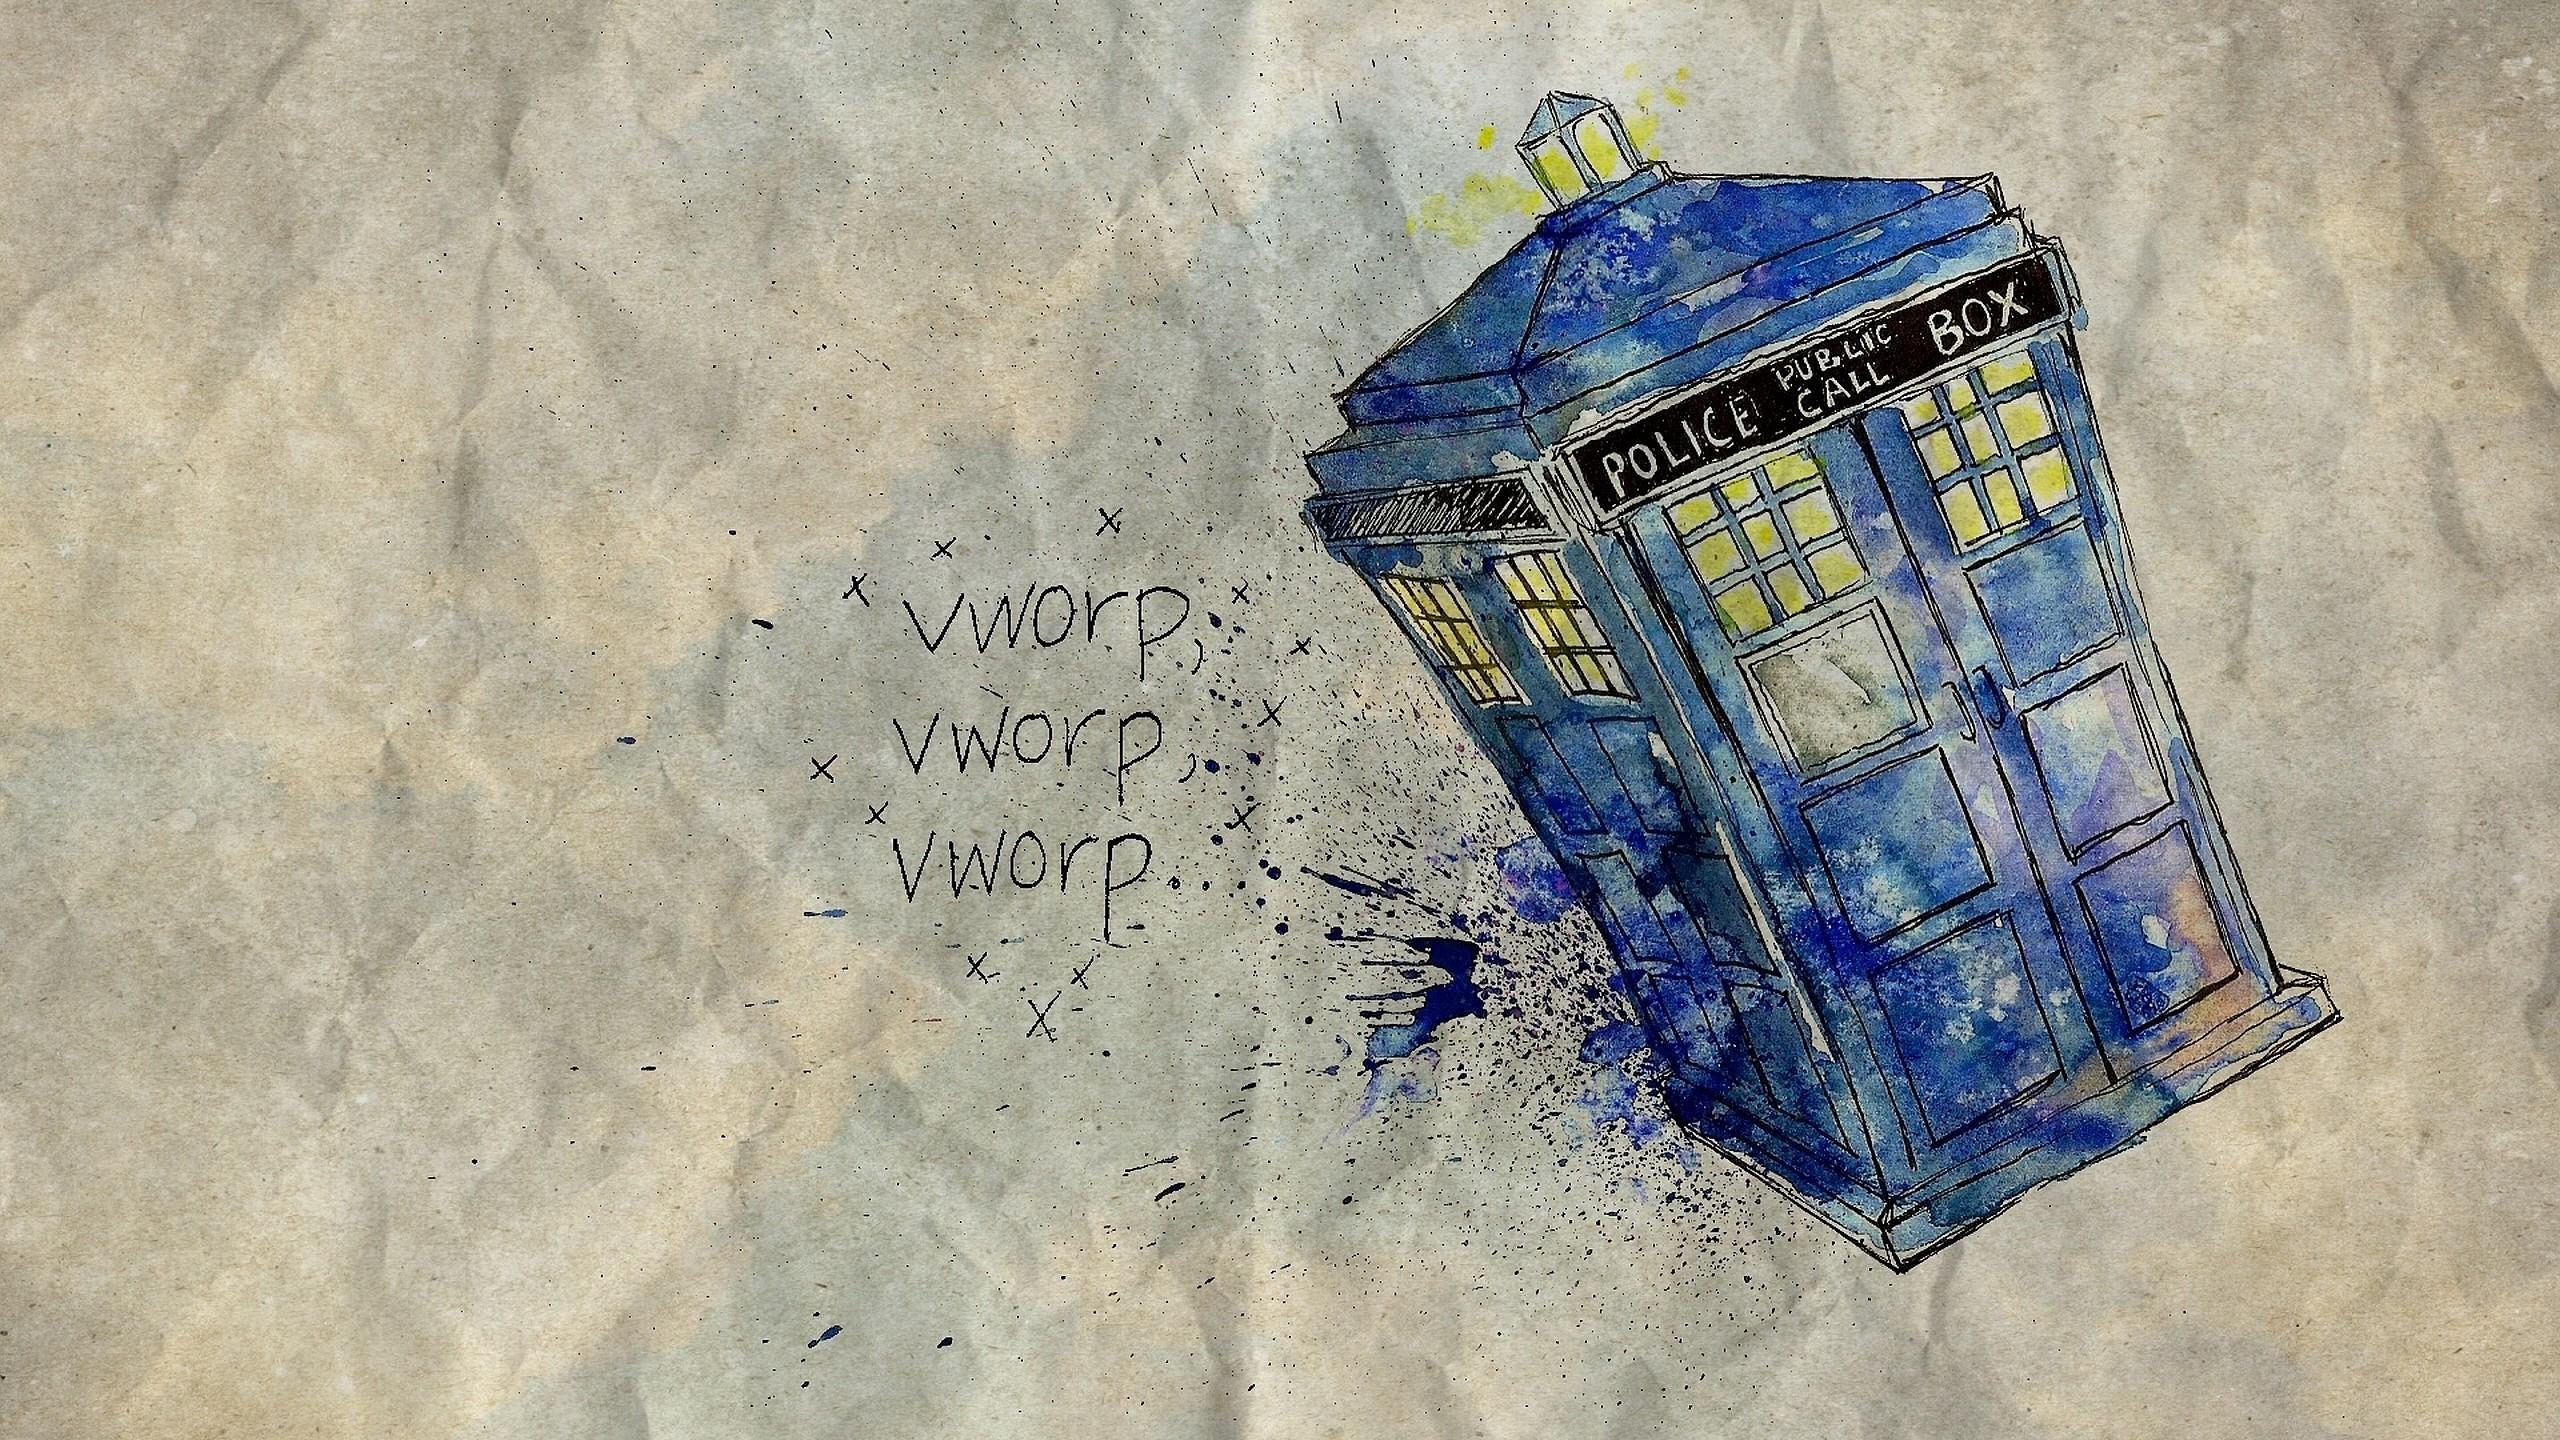 Doctor Who HD Wallpaper 1920×1080 Doctor Who HD Wallpaper 1920×1200